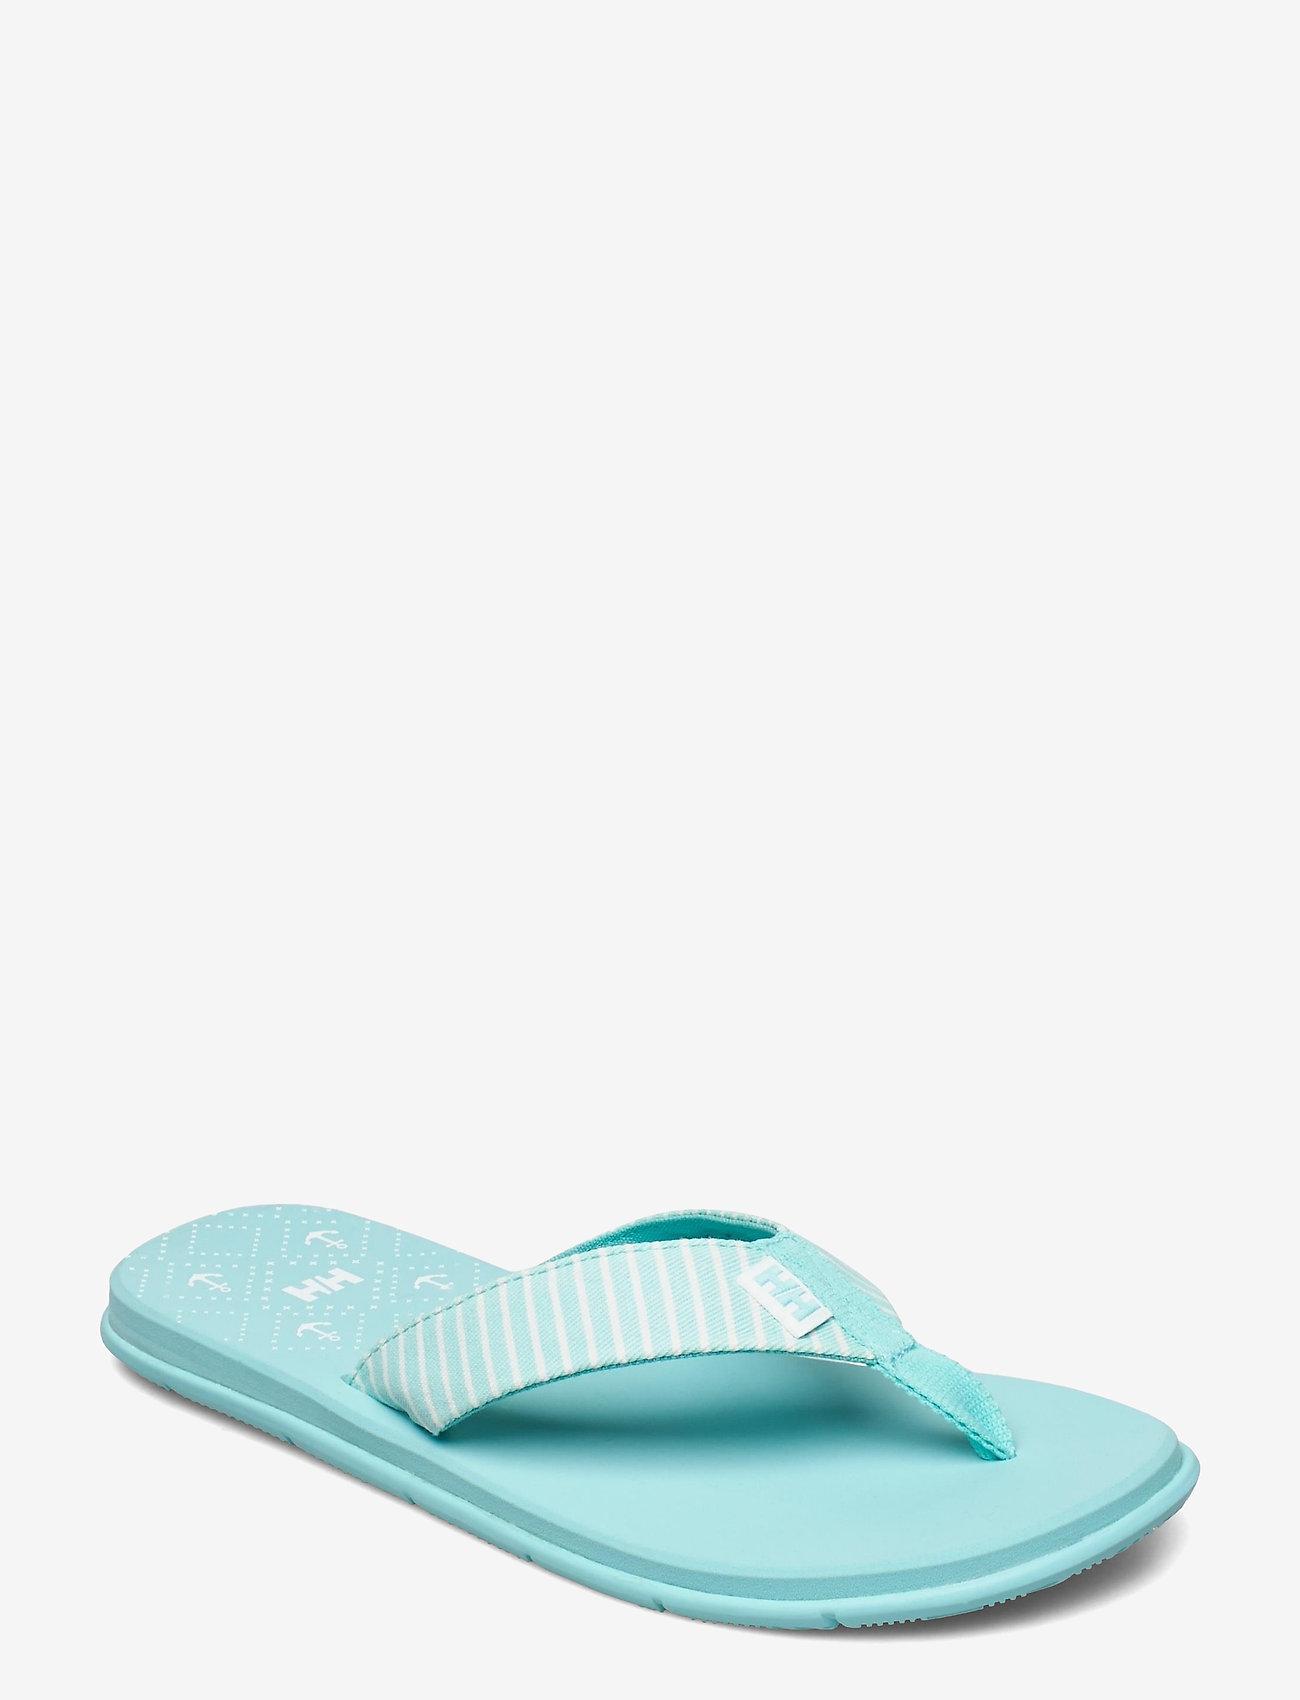 Helly Hansen - W IRIS SANDAL - sport schoenen - glacier blue / off white - 0